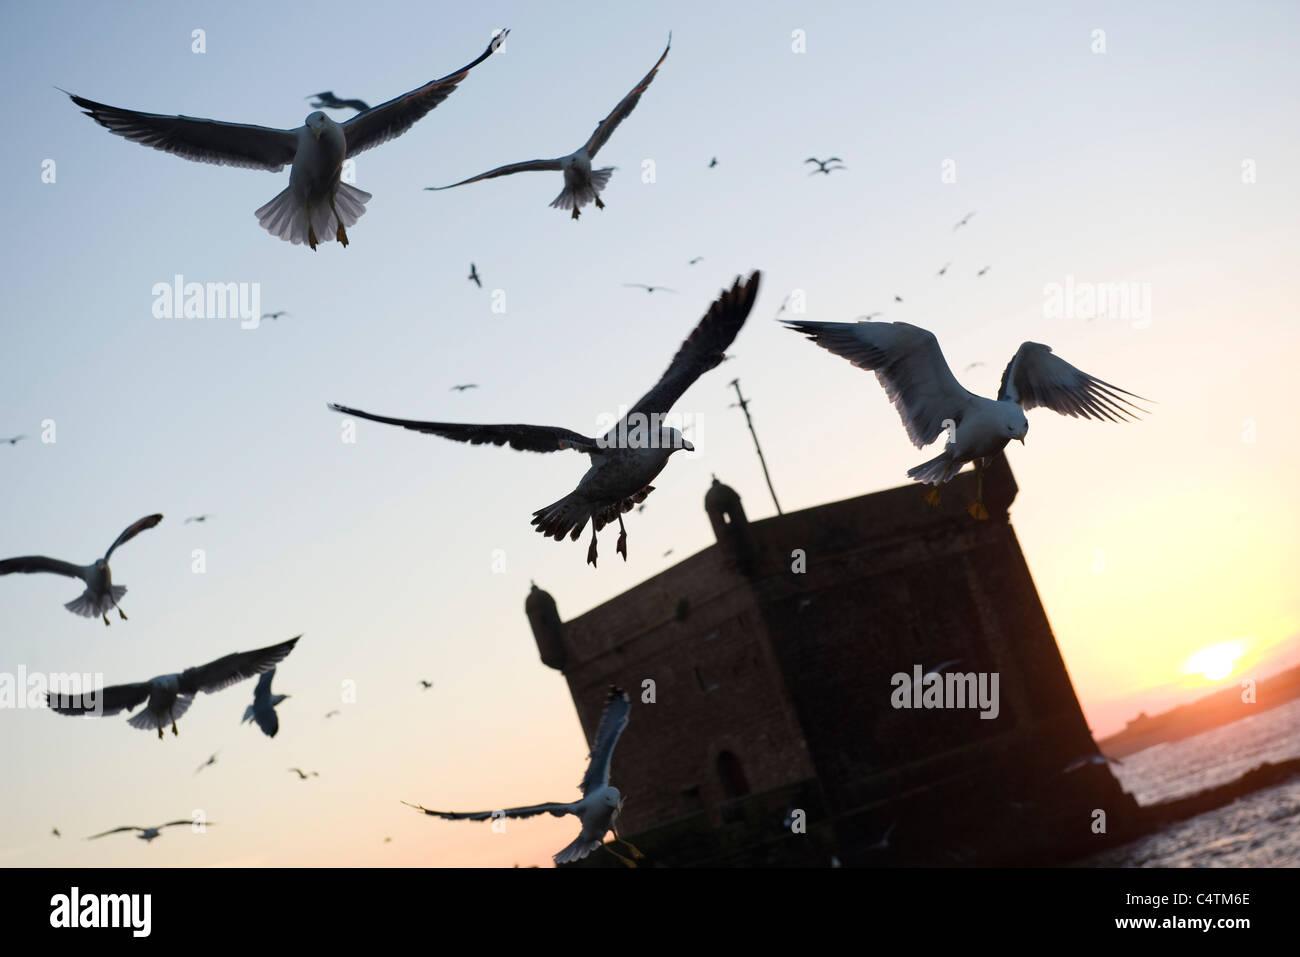 Gulls flying over sea - Stock Image